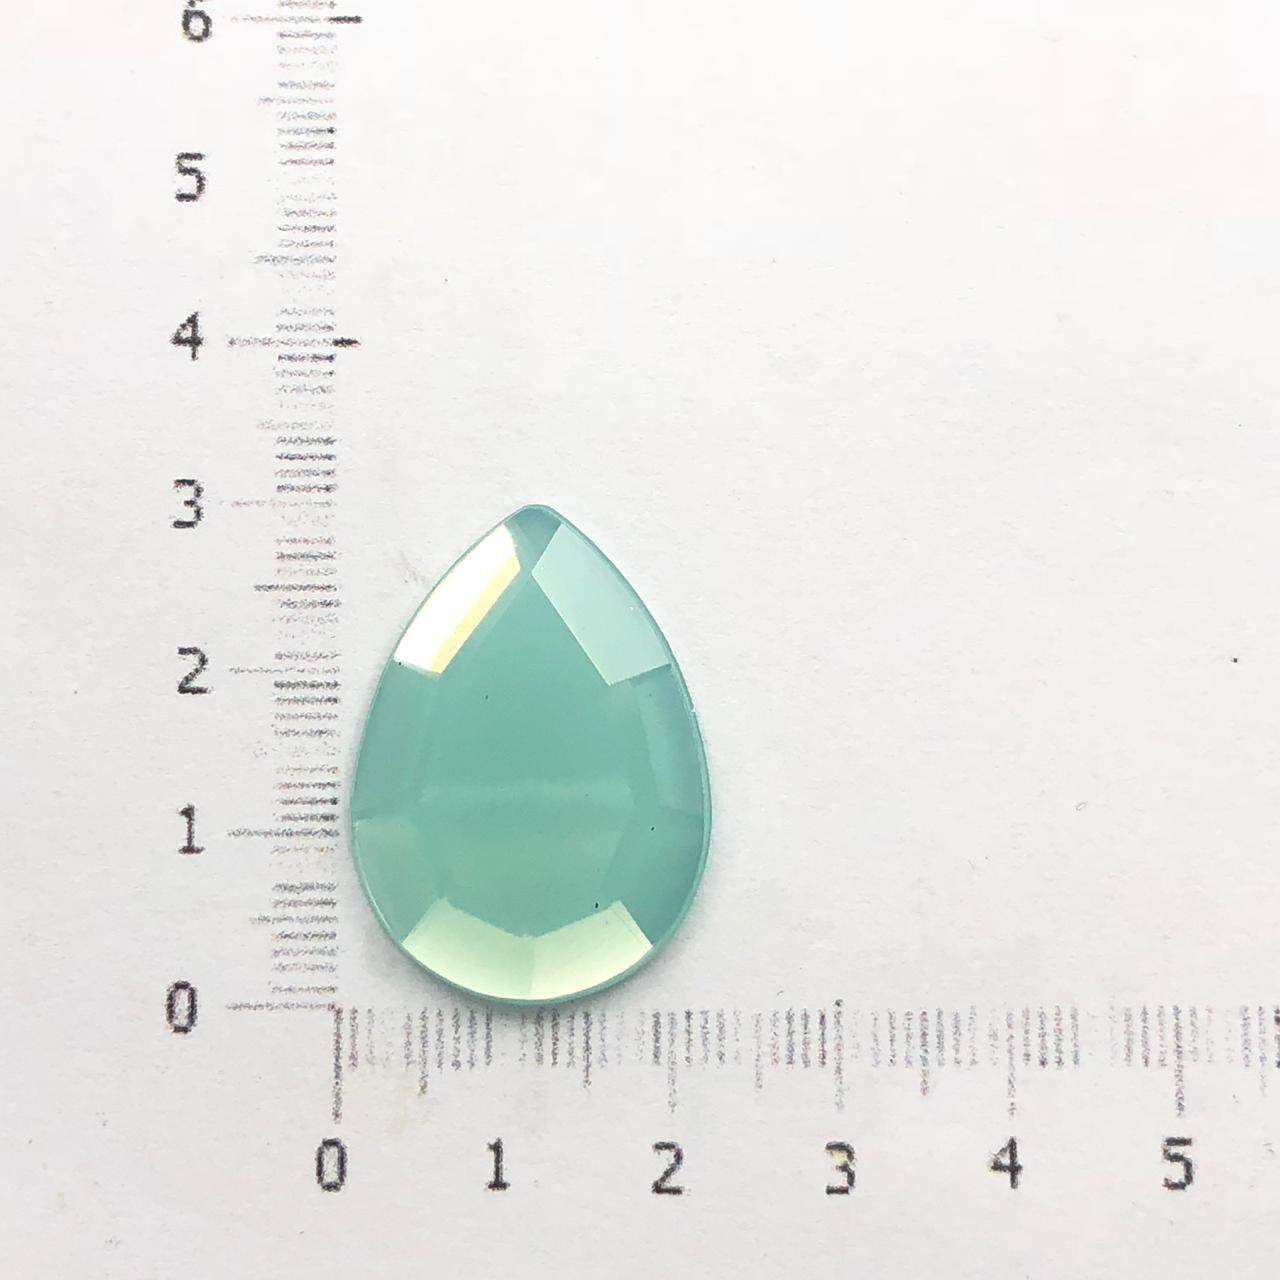 CHT793 - Chaton Gota 18x25 Pacific Opal - 2Unids